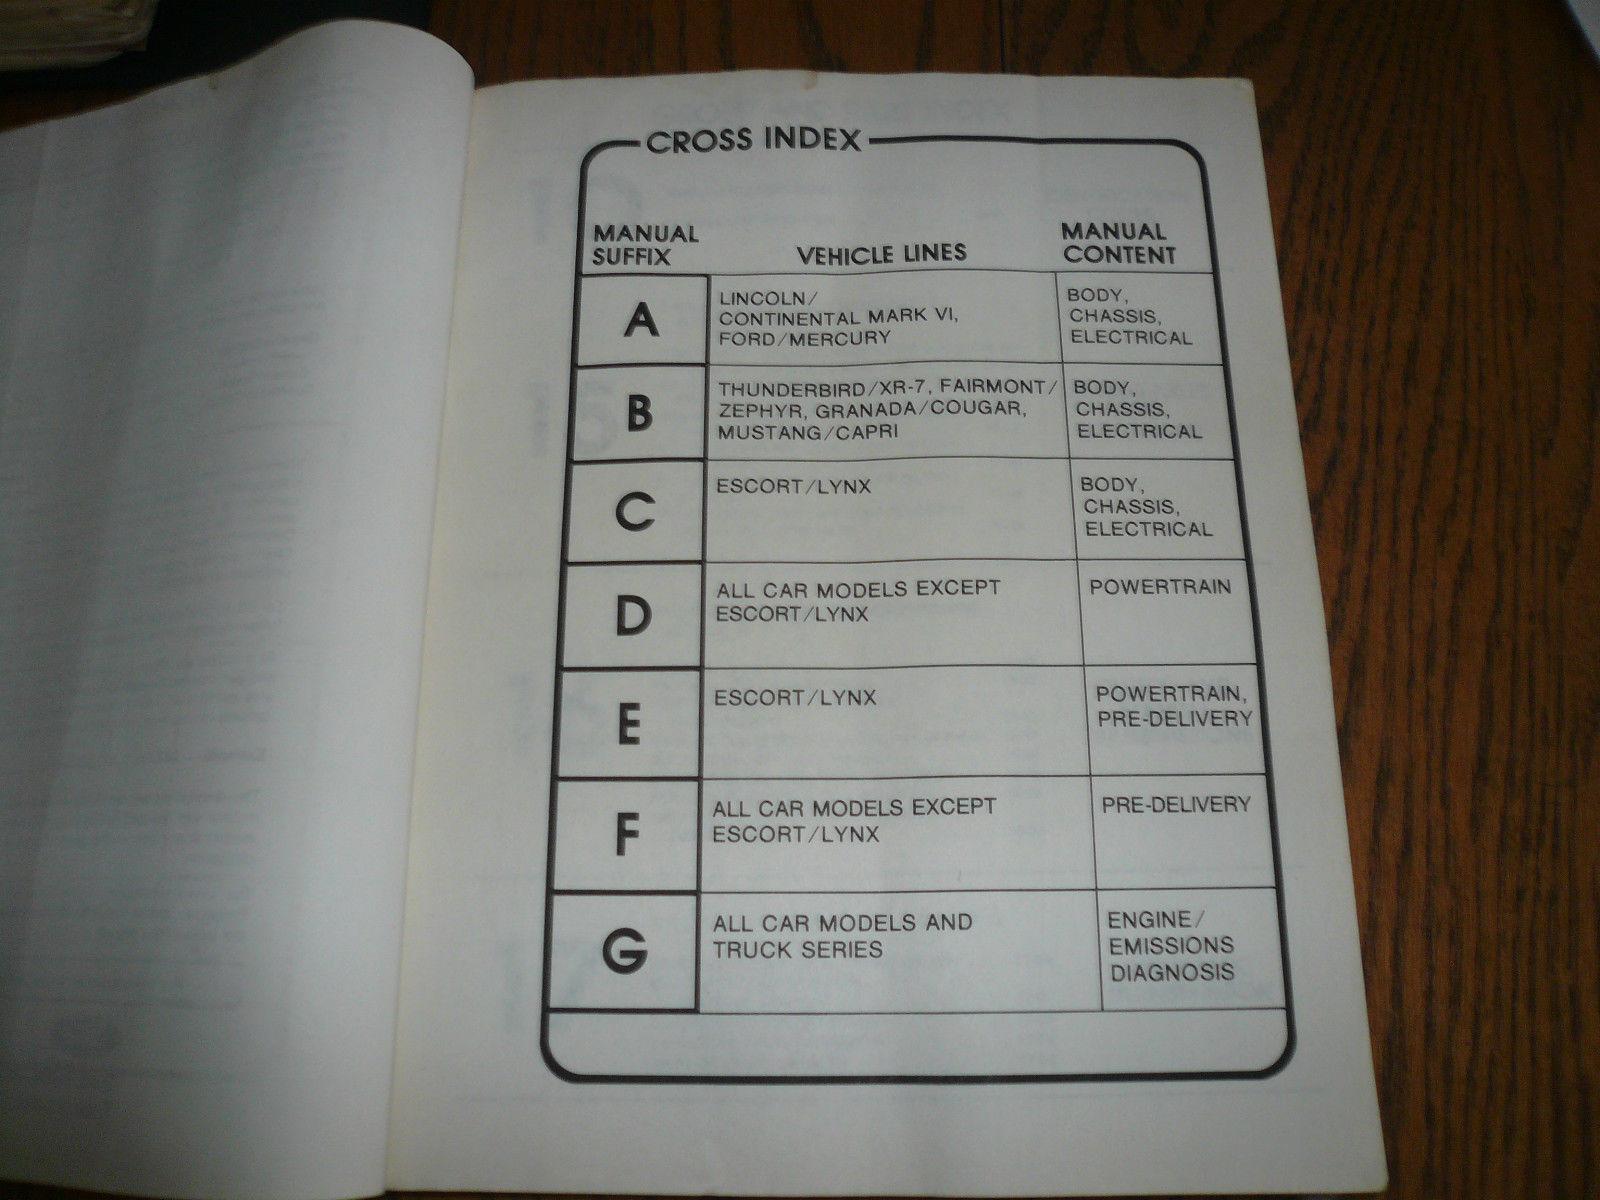 ... 1981 Ford Car Shop Manual - Powertrain - All Models Except Escort Lynx